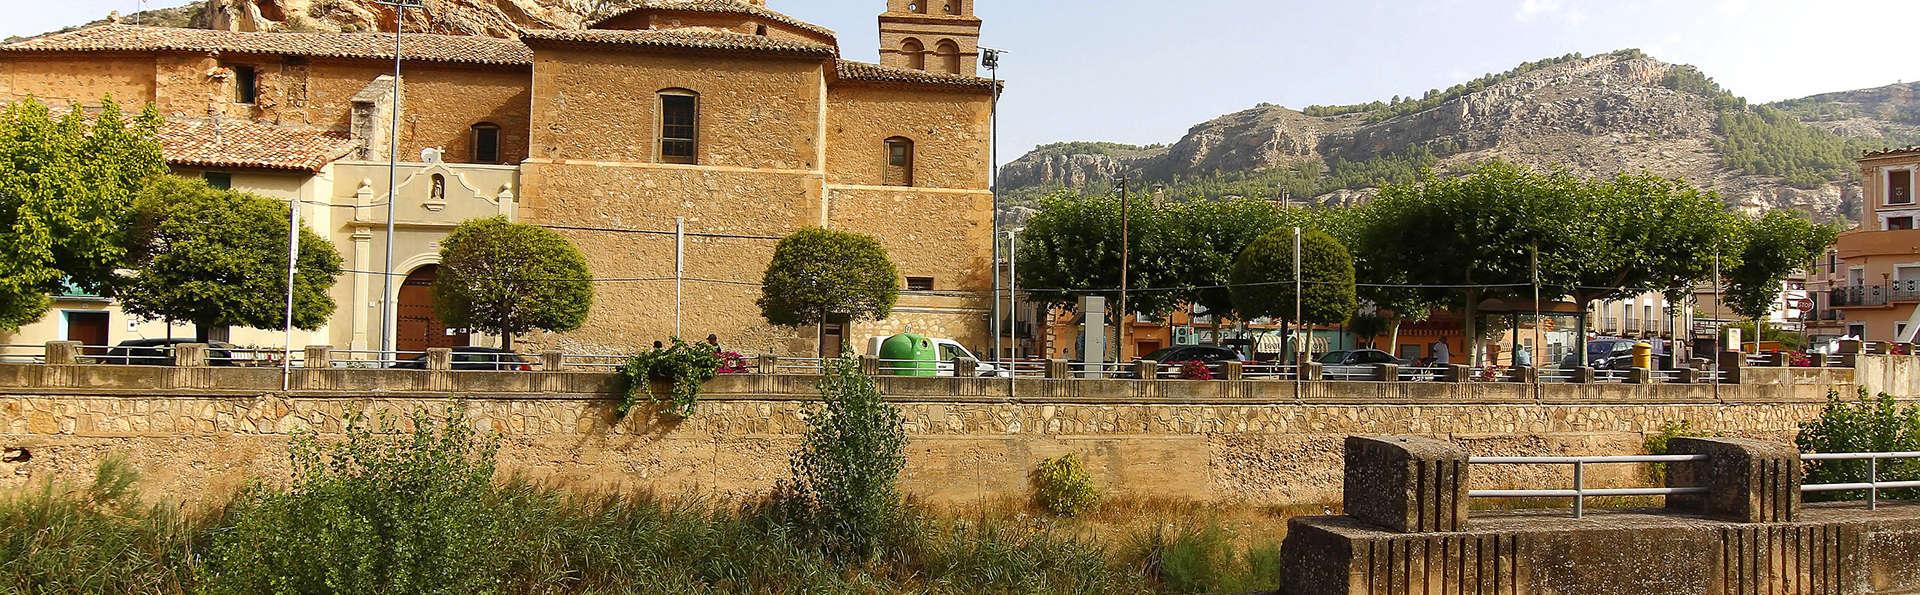 Balneario Termas Pallares - Hotel Parque - edit_shutterstock_138191075_Alhama-de-Aragon.jpg